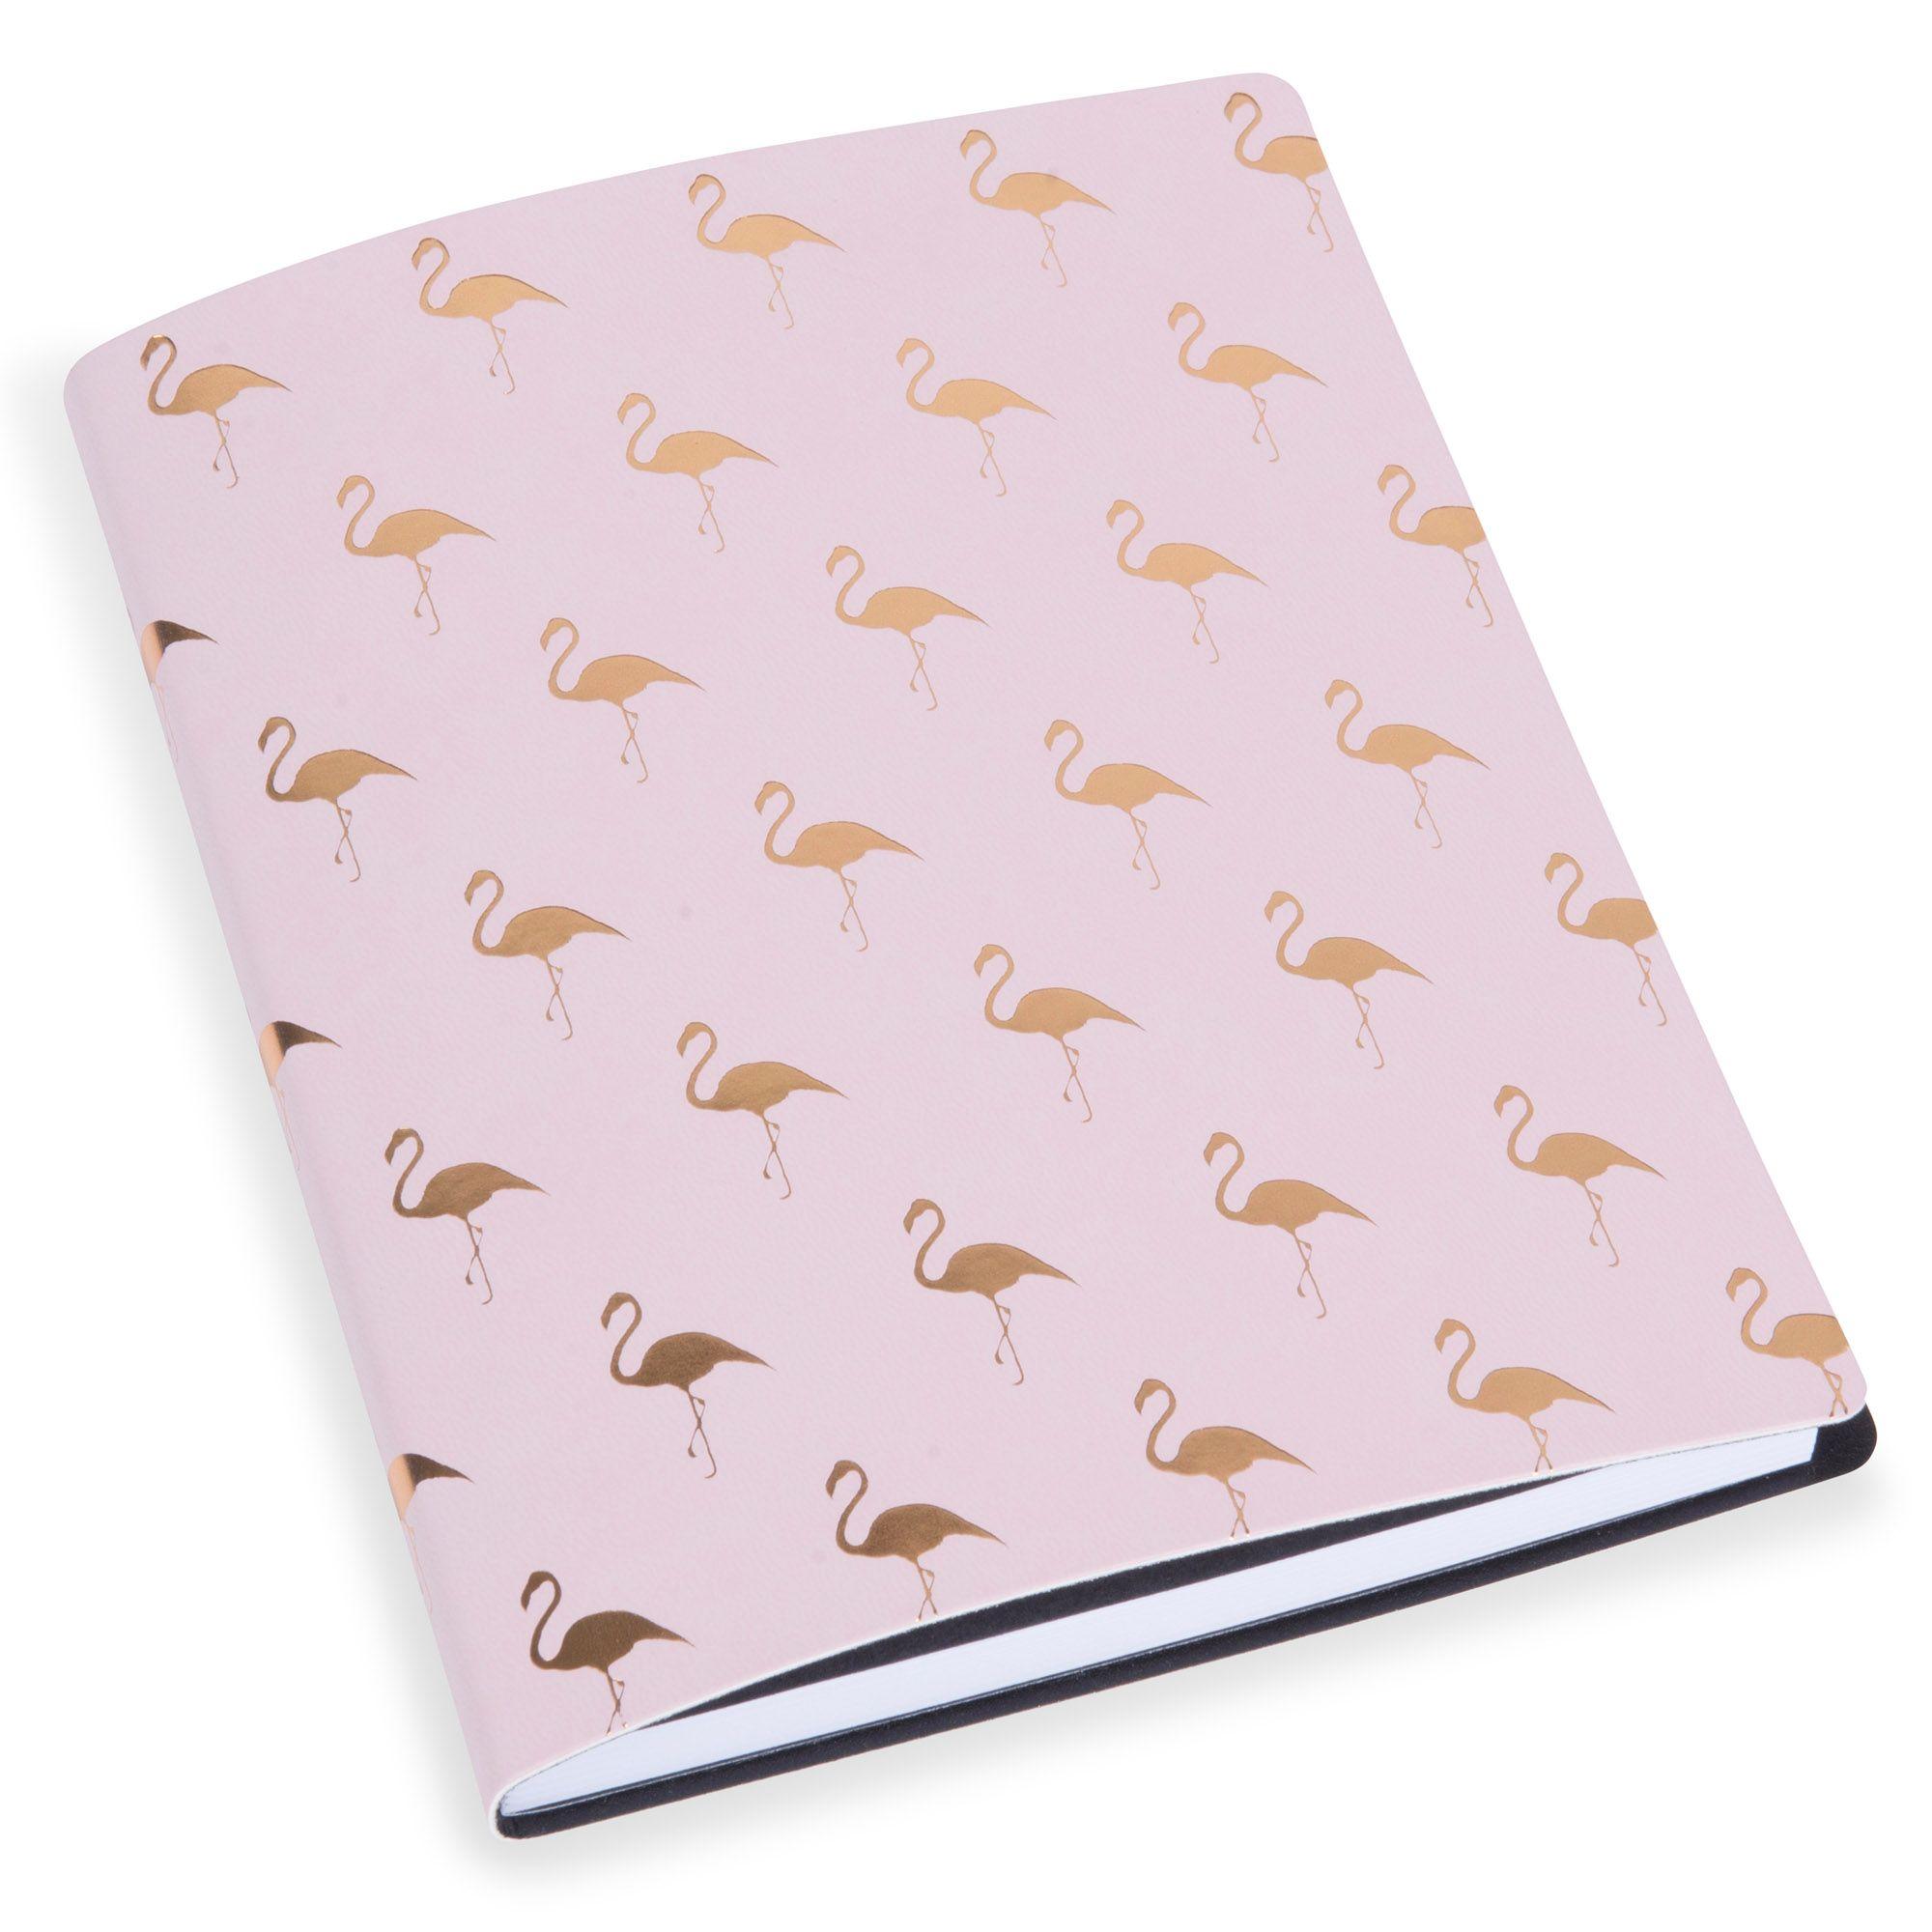 carnet de notes flamingos pink maisons du monde stationary pinterest flamingo planners. Black Bedroom Furniture Sets. Home Design Ideas